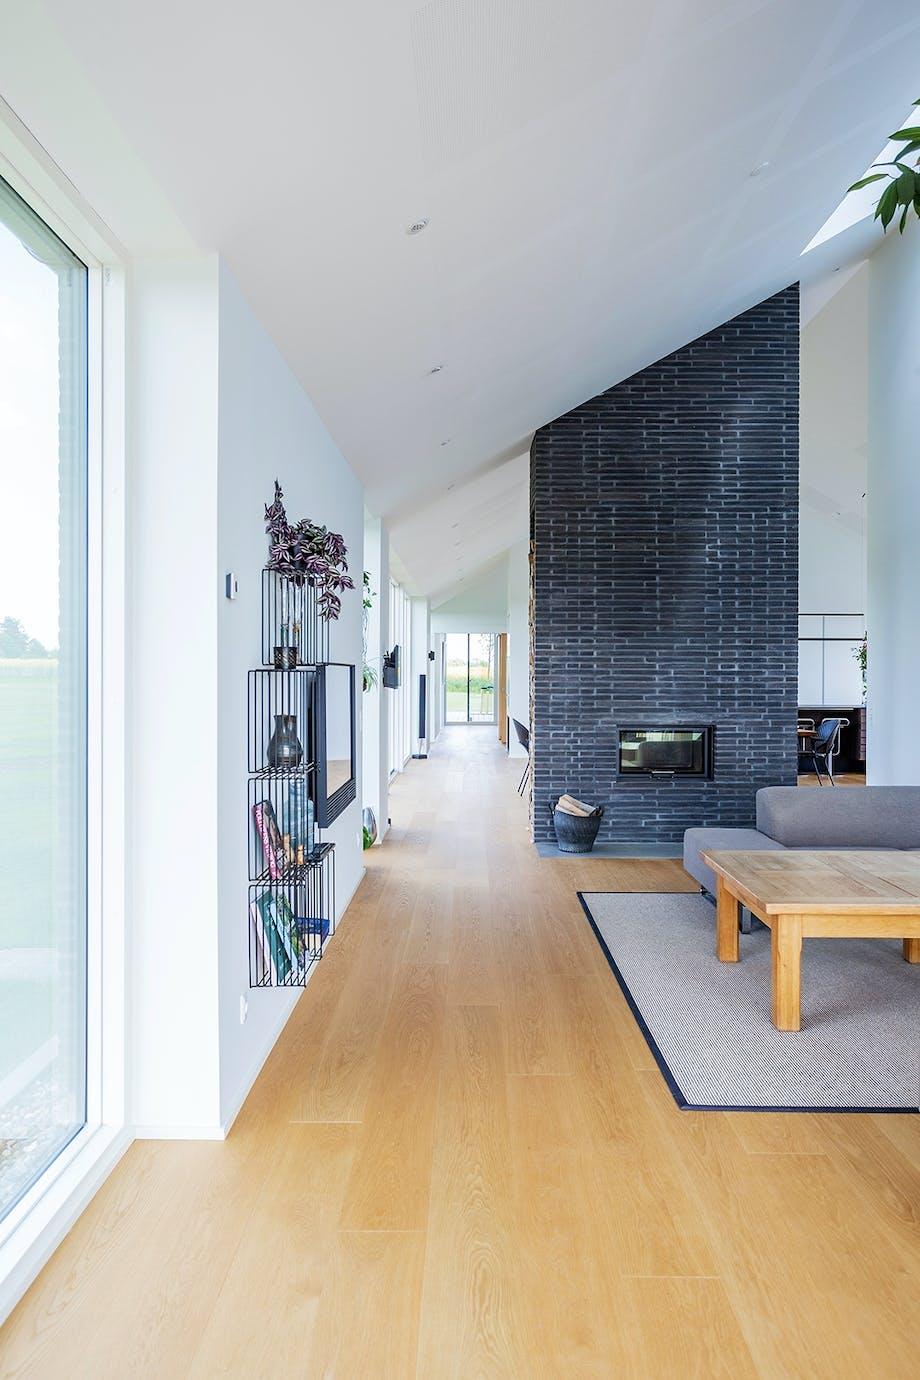 Stue mur sofa Bolia højt til loftet